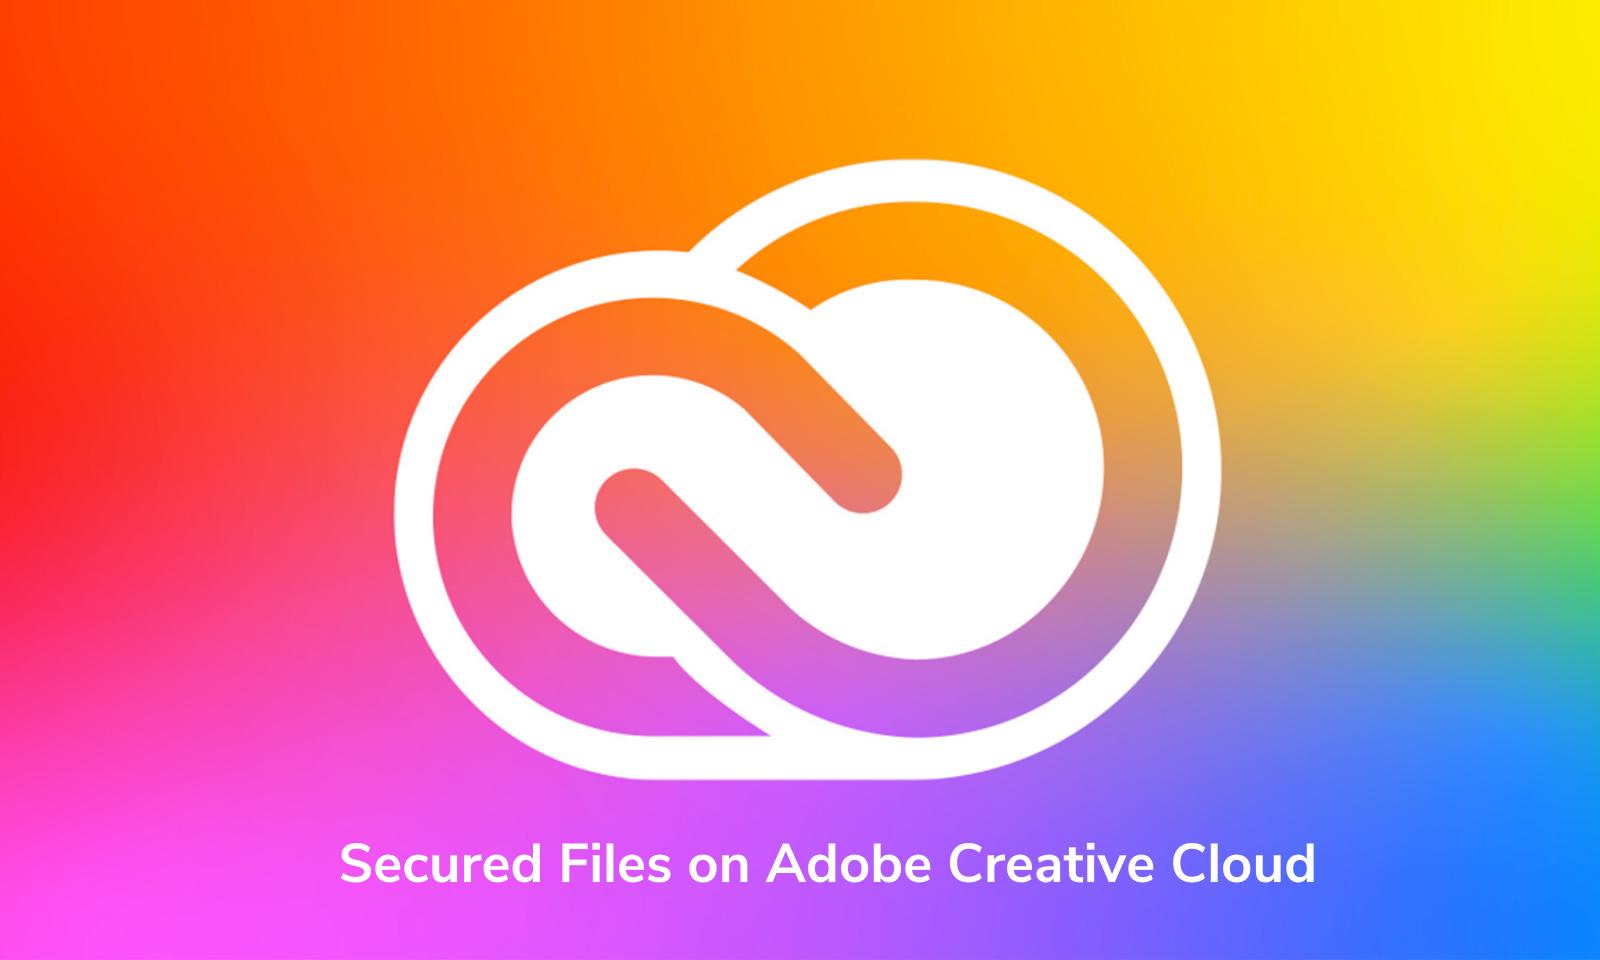 Secured Files on Adobe Creative Cloud